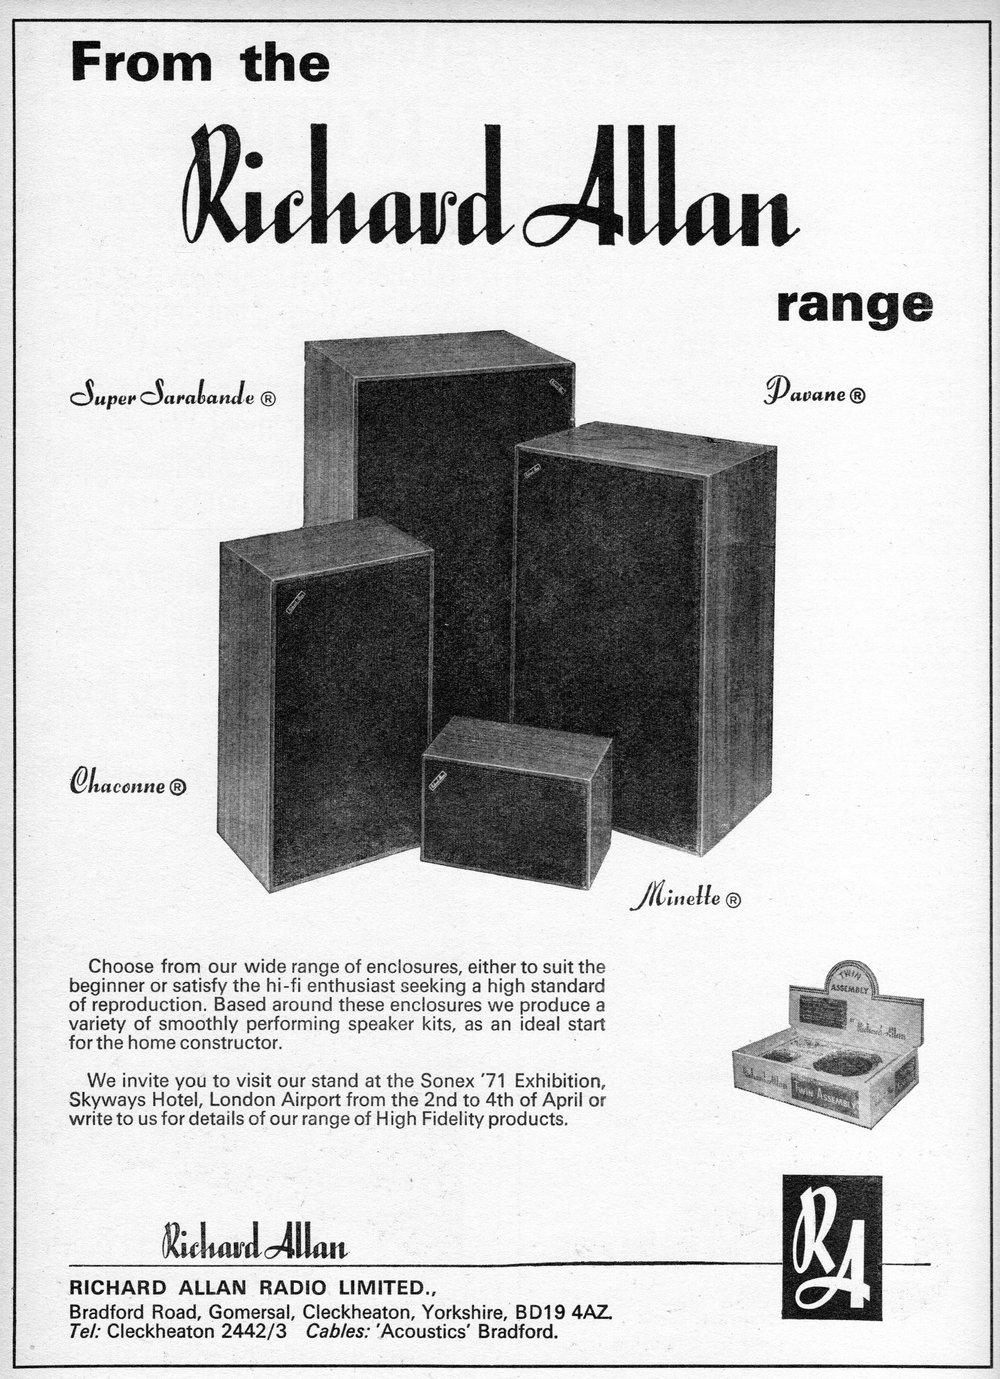 Richard Allan Minette, Chaconne, Davane, Super Sarabande Advert 1971.jpg